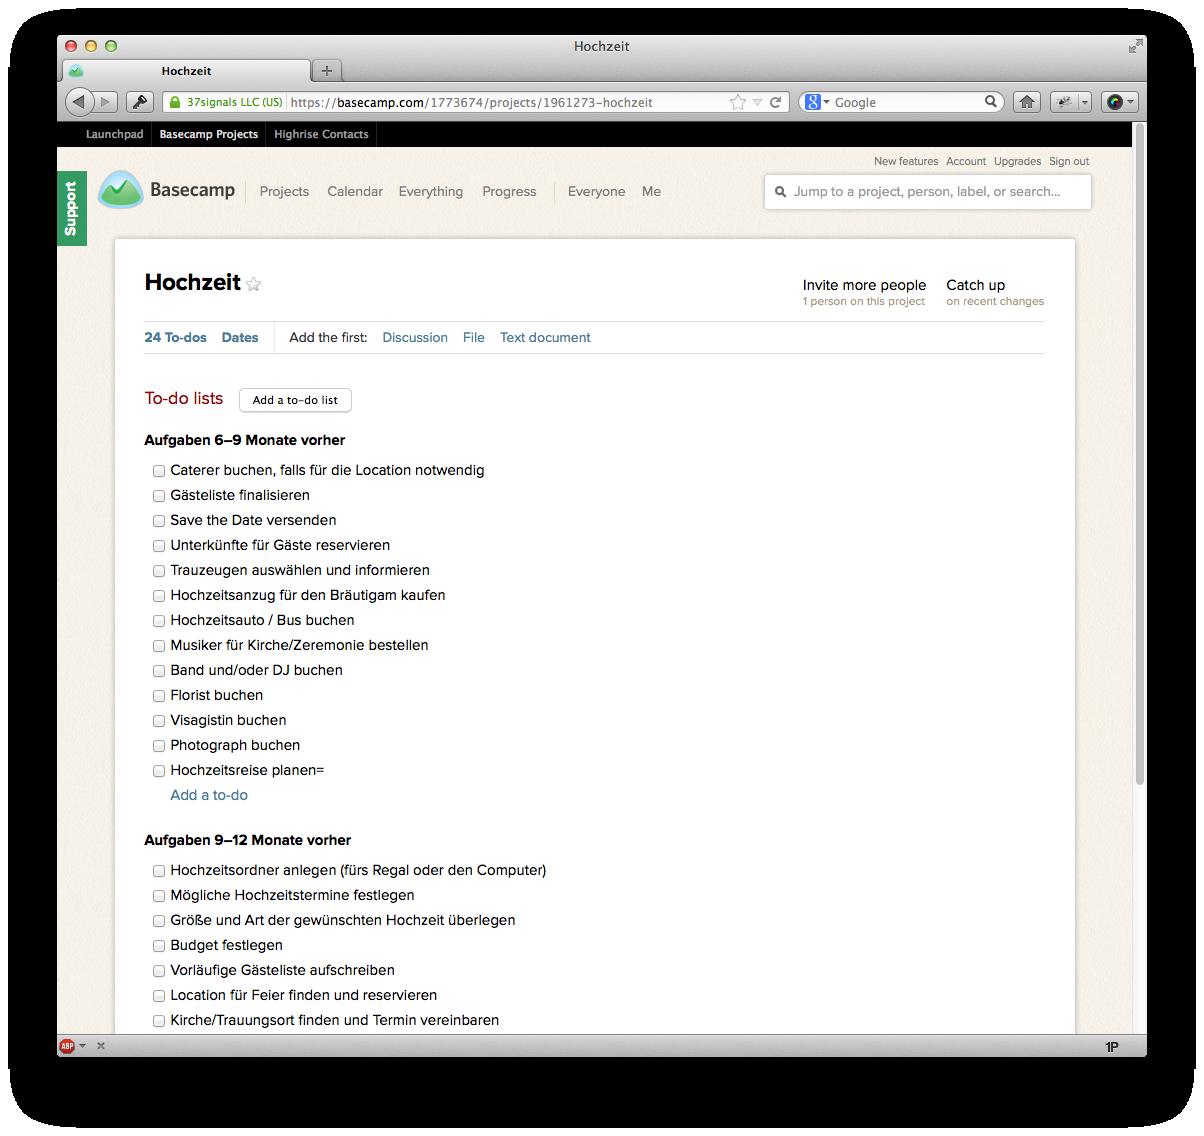 Großzügig Basecamp Projektvorlagen Galerie - Entry Level Resume ...